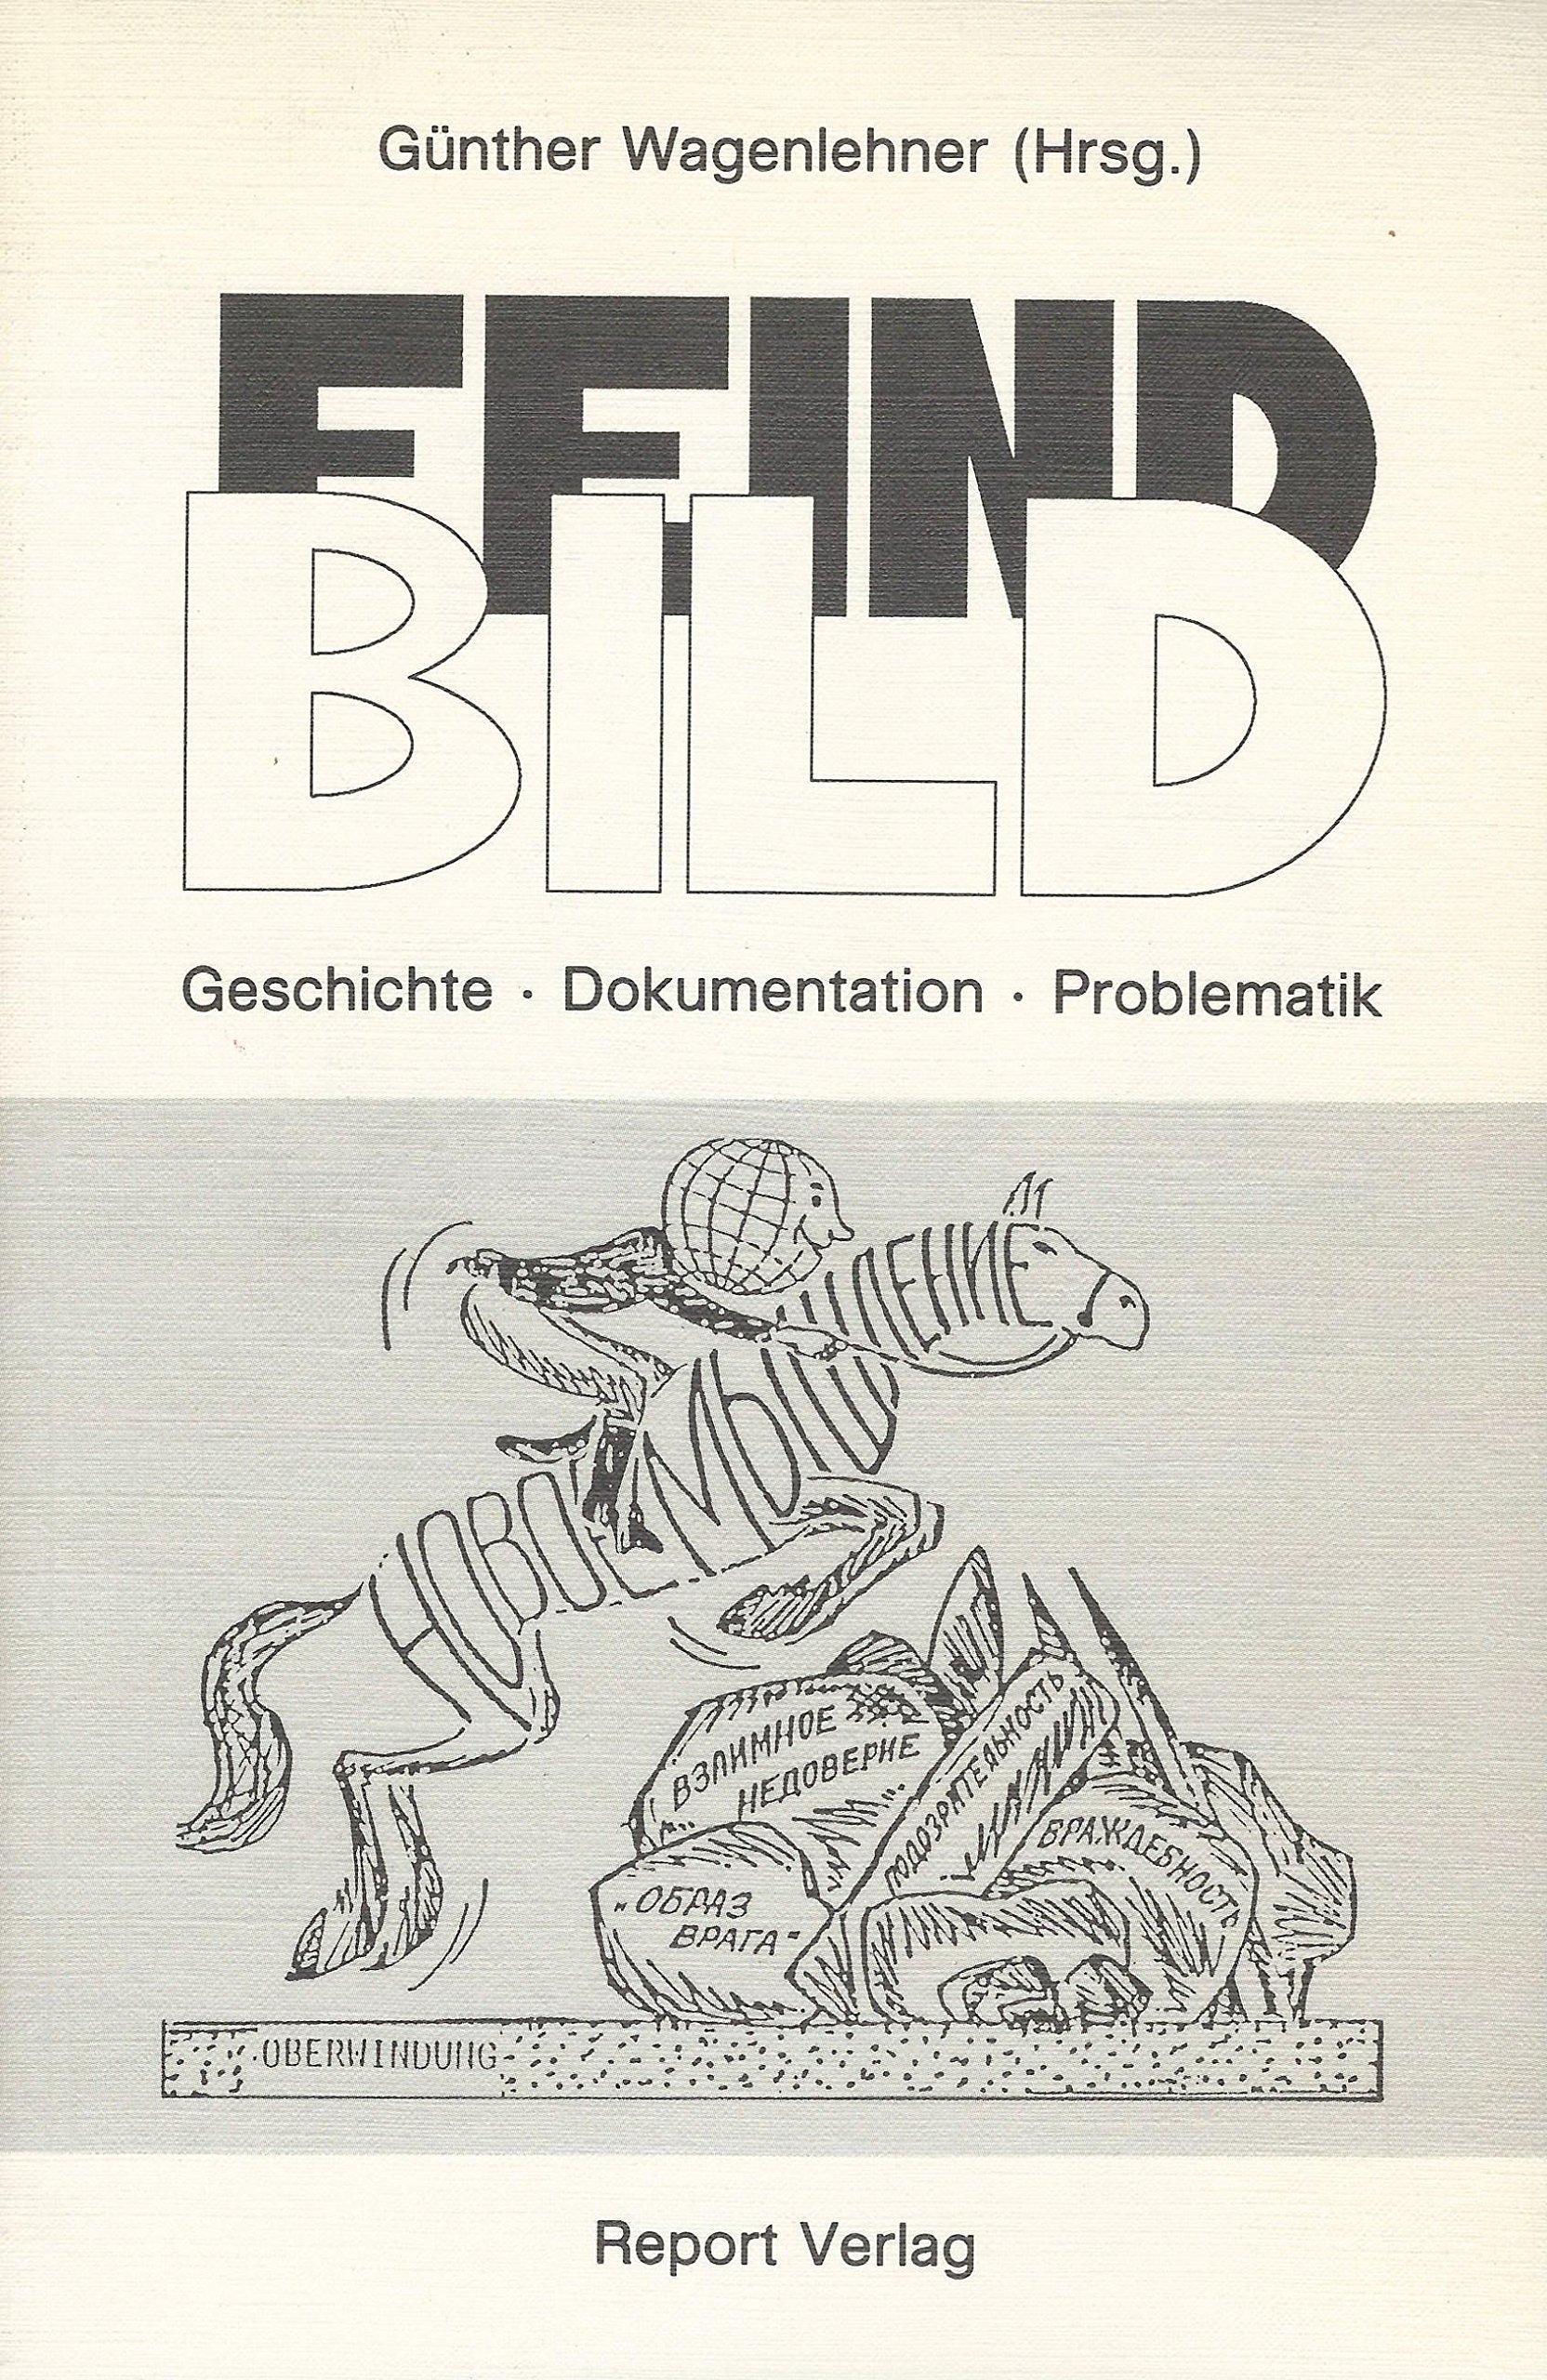 Feindbild. Geschichte. Dokumentation. Problematik Gebundenes Buch – 1989 Günther (Hrsg.) Wagenlehner Report Verlag 3524890040 MAK_GD_9783524890043